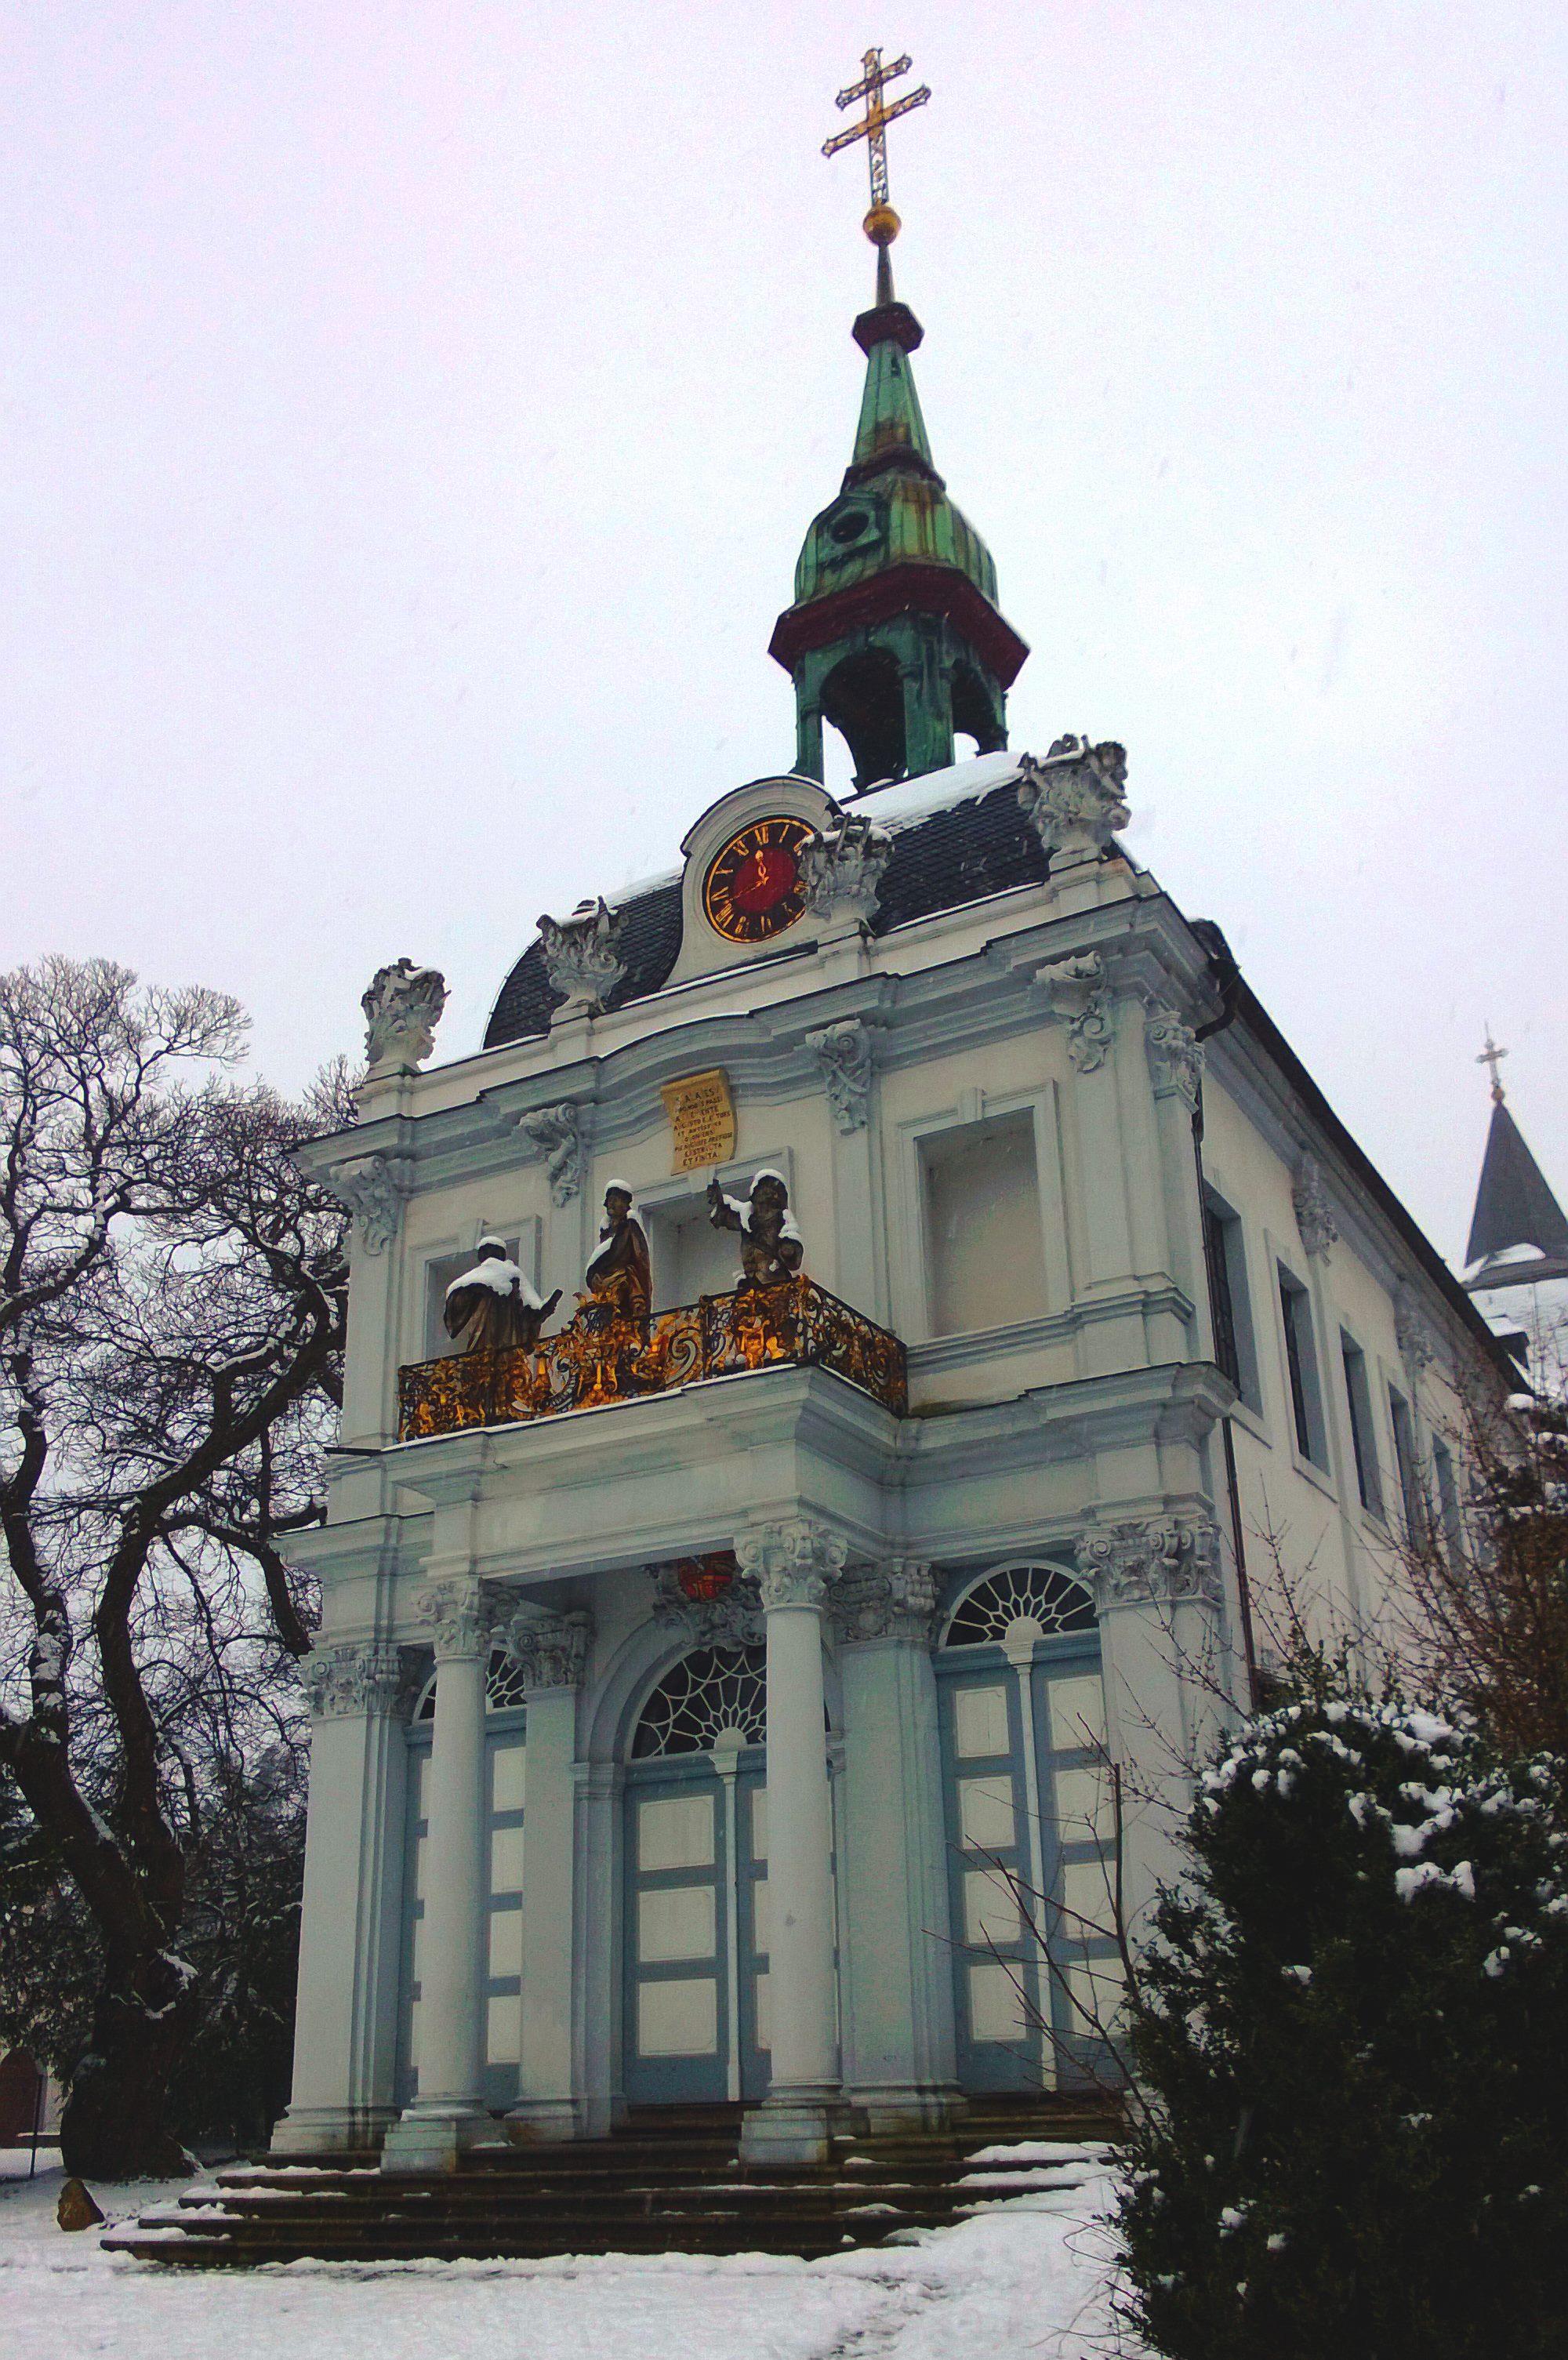 ippendorf-kreuzberg